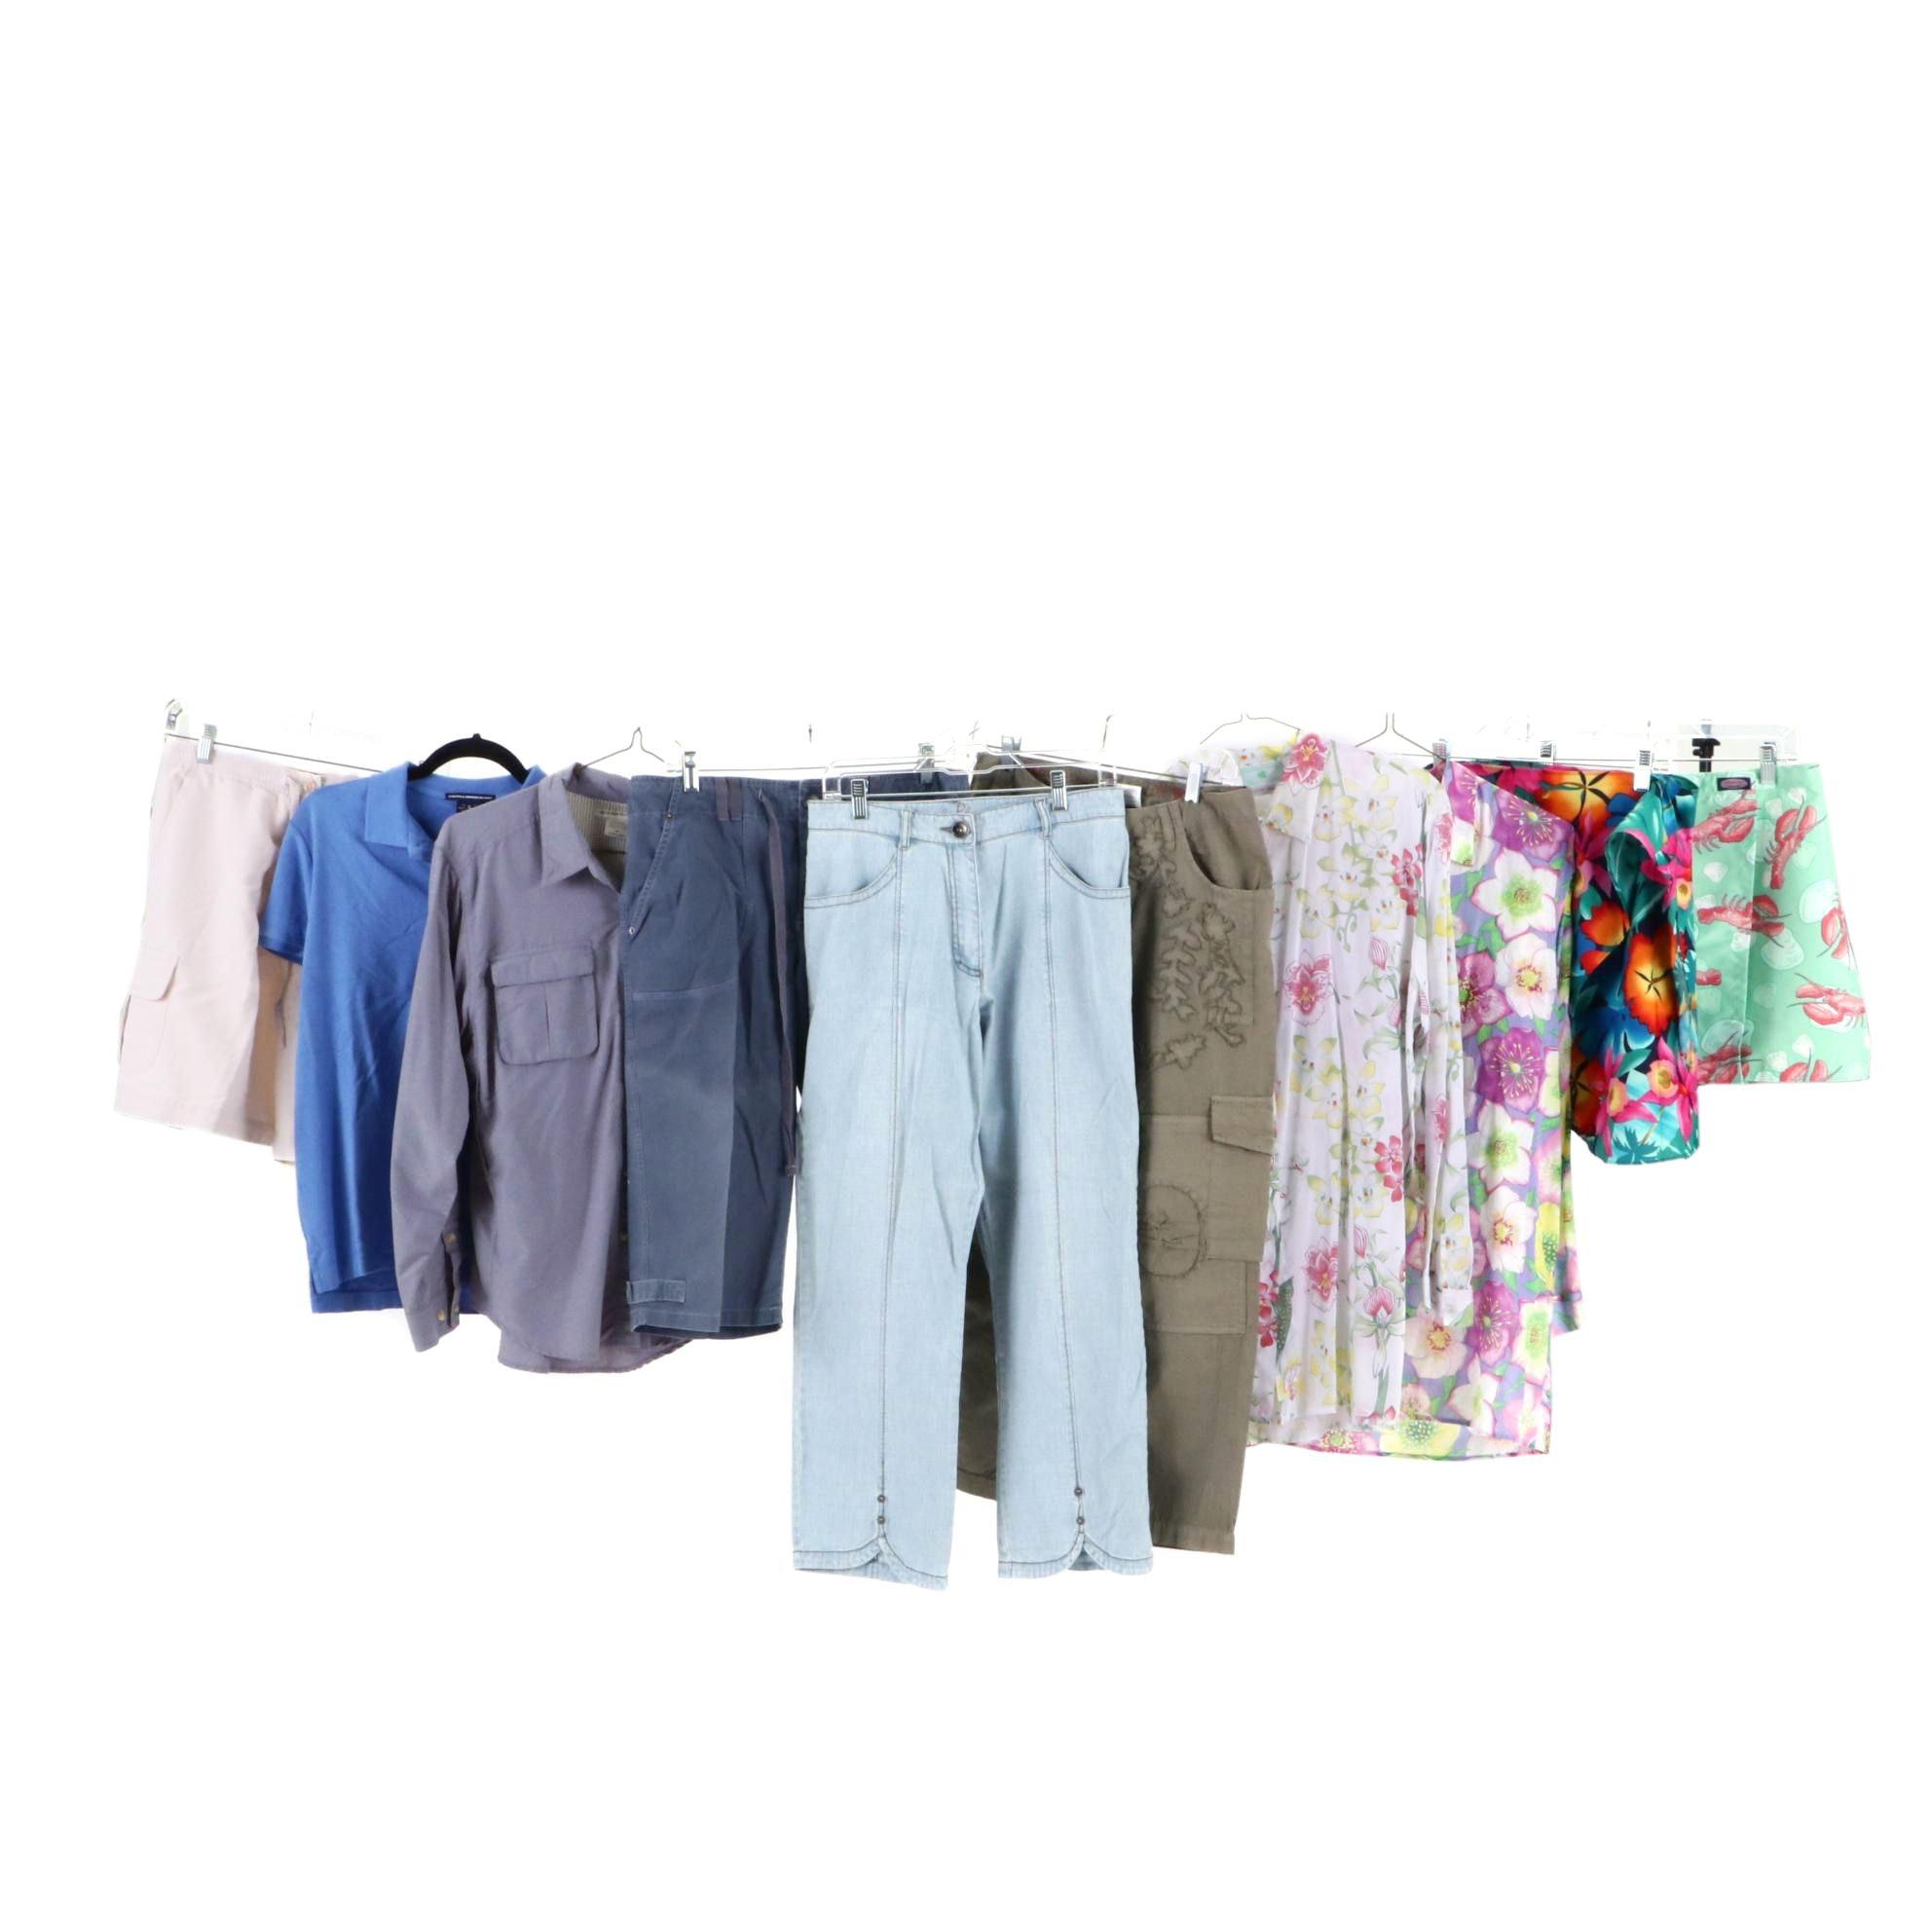 Ralph Lauren Sport, Ex Officio and Manuel Canovas Shirts, Pants, Shorts and Wrap